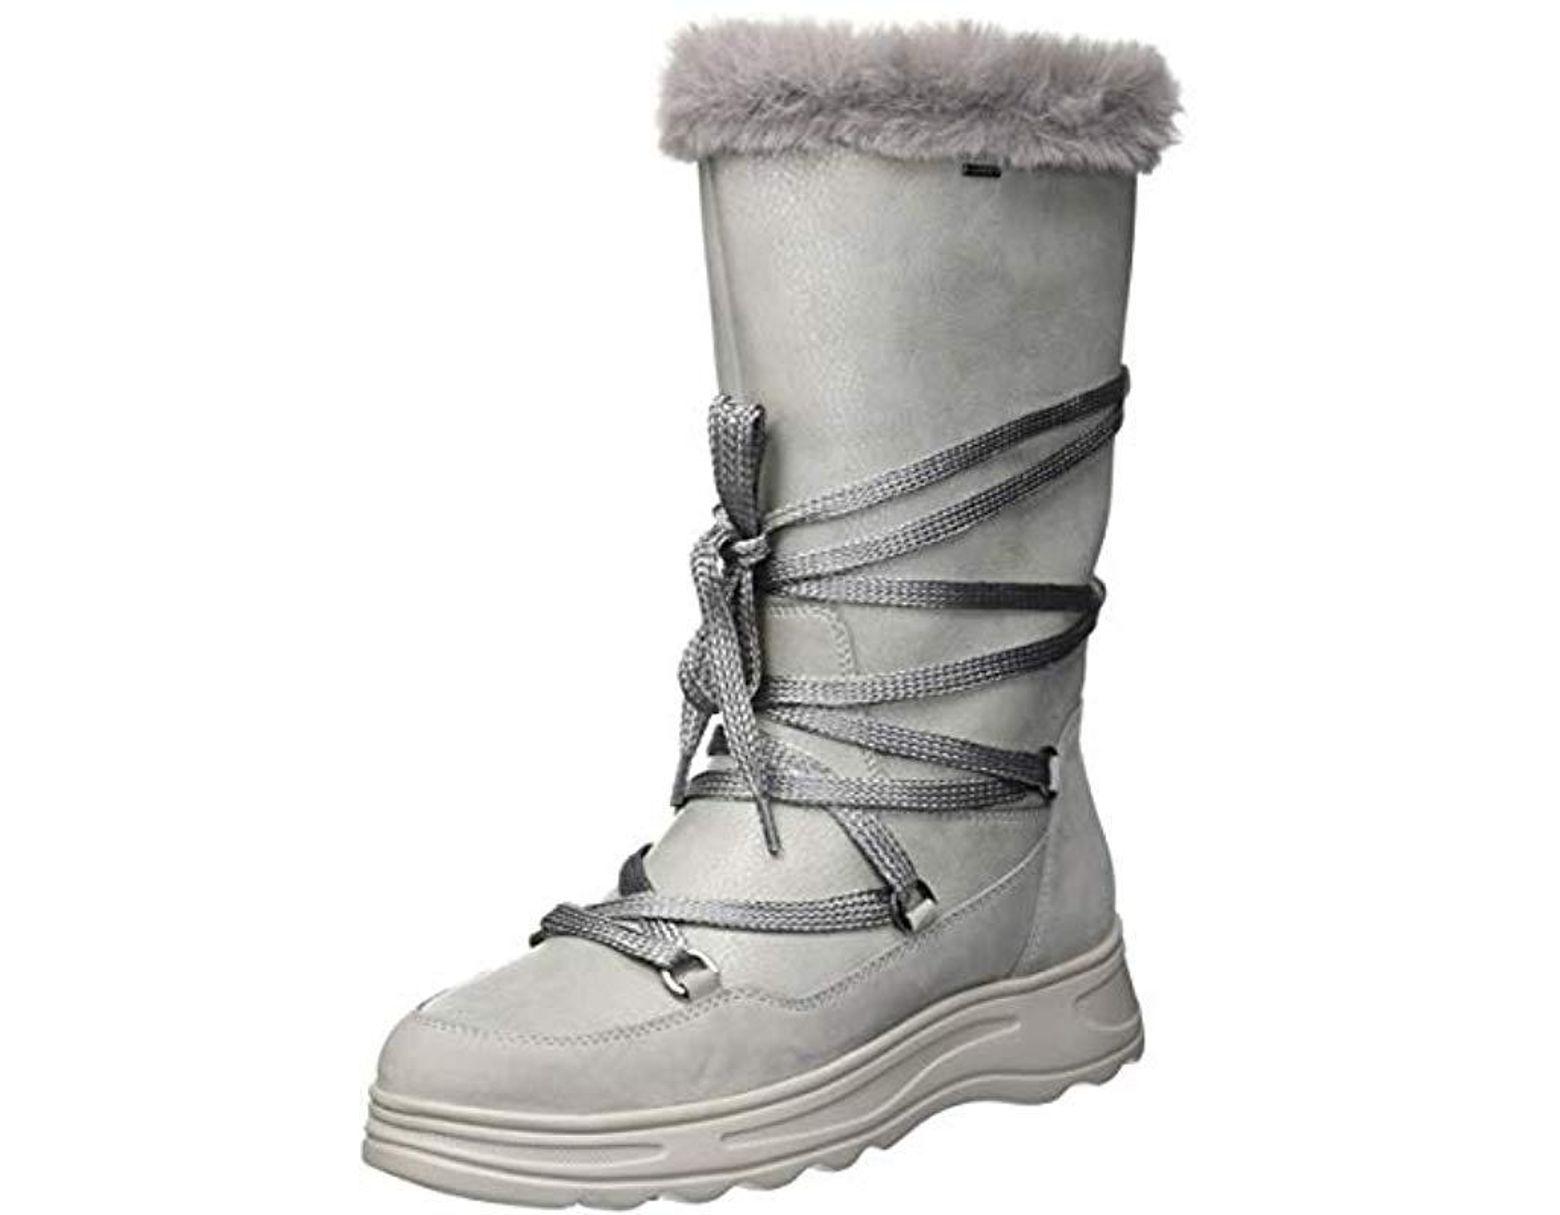 aba80c56835 Geox D Hosmos B Abx B Snow Boots in Gray - Lyst